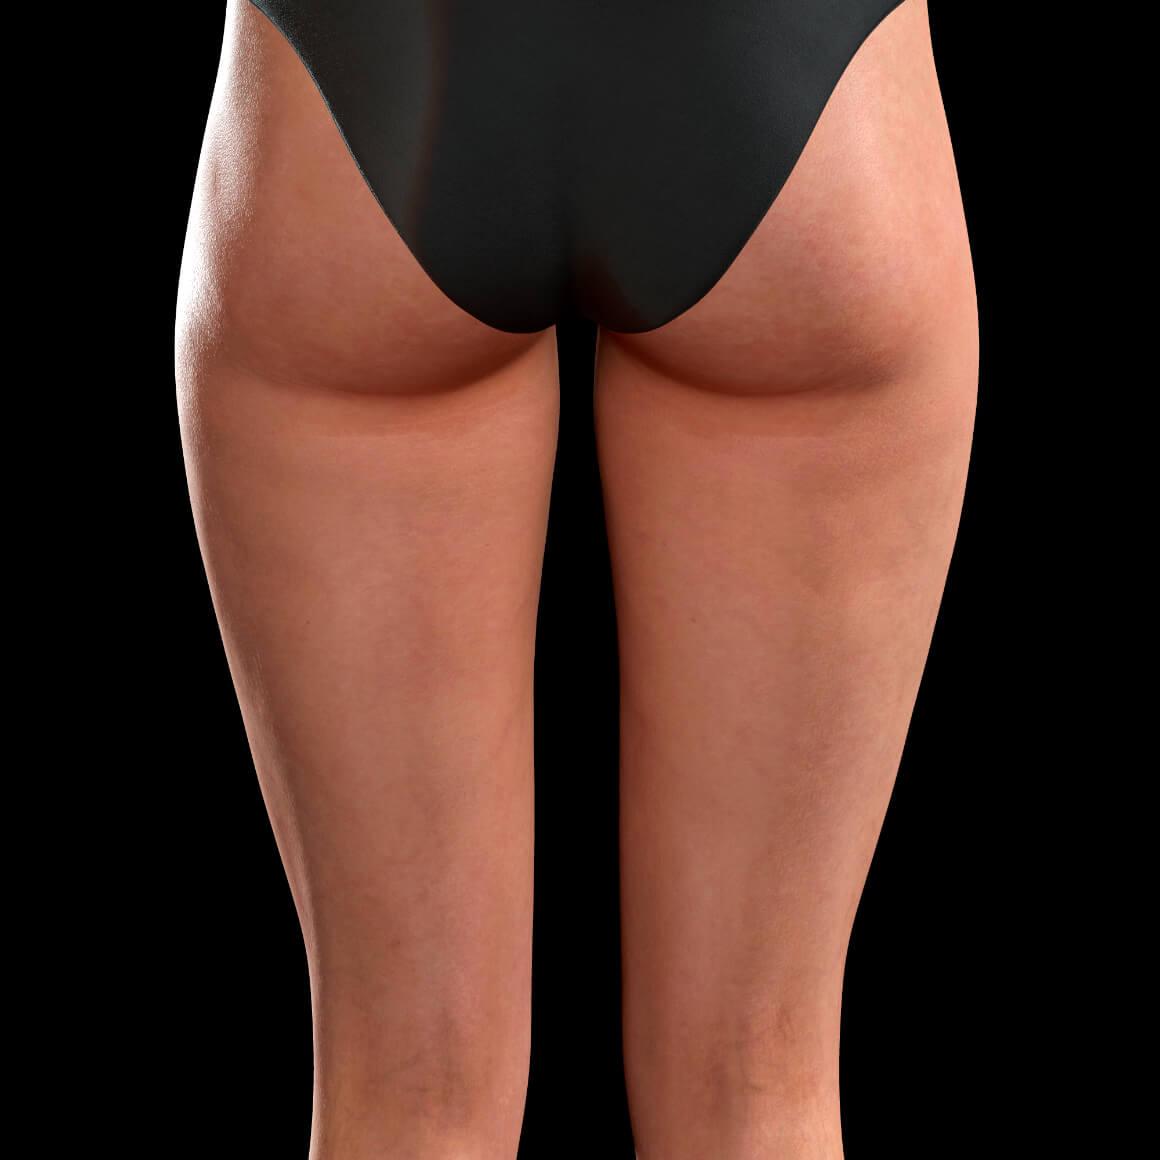 Back thighs of a Clinique Chloé female patient after a Profound RF cellulite treatment